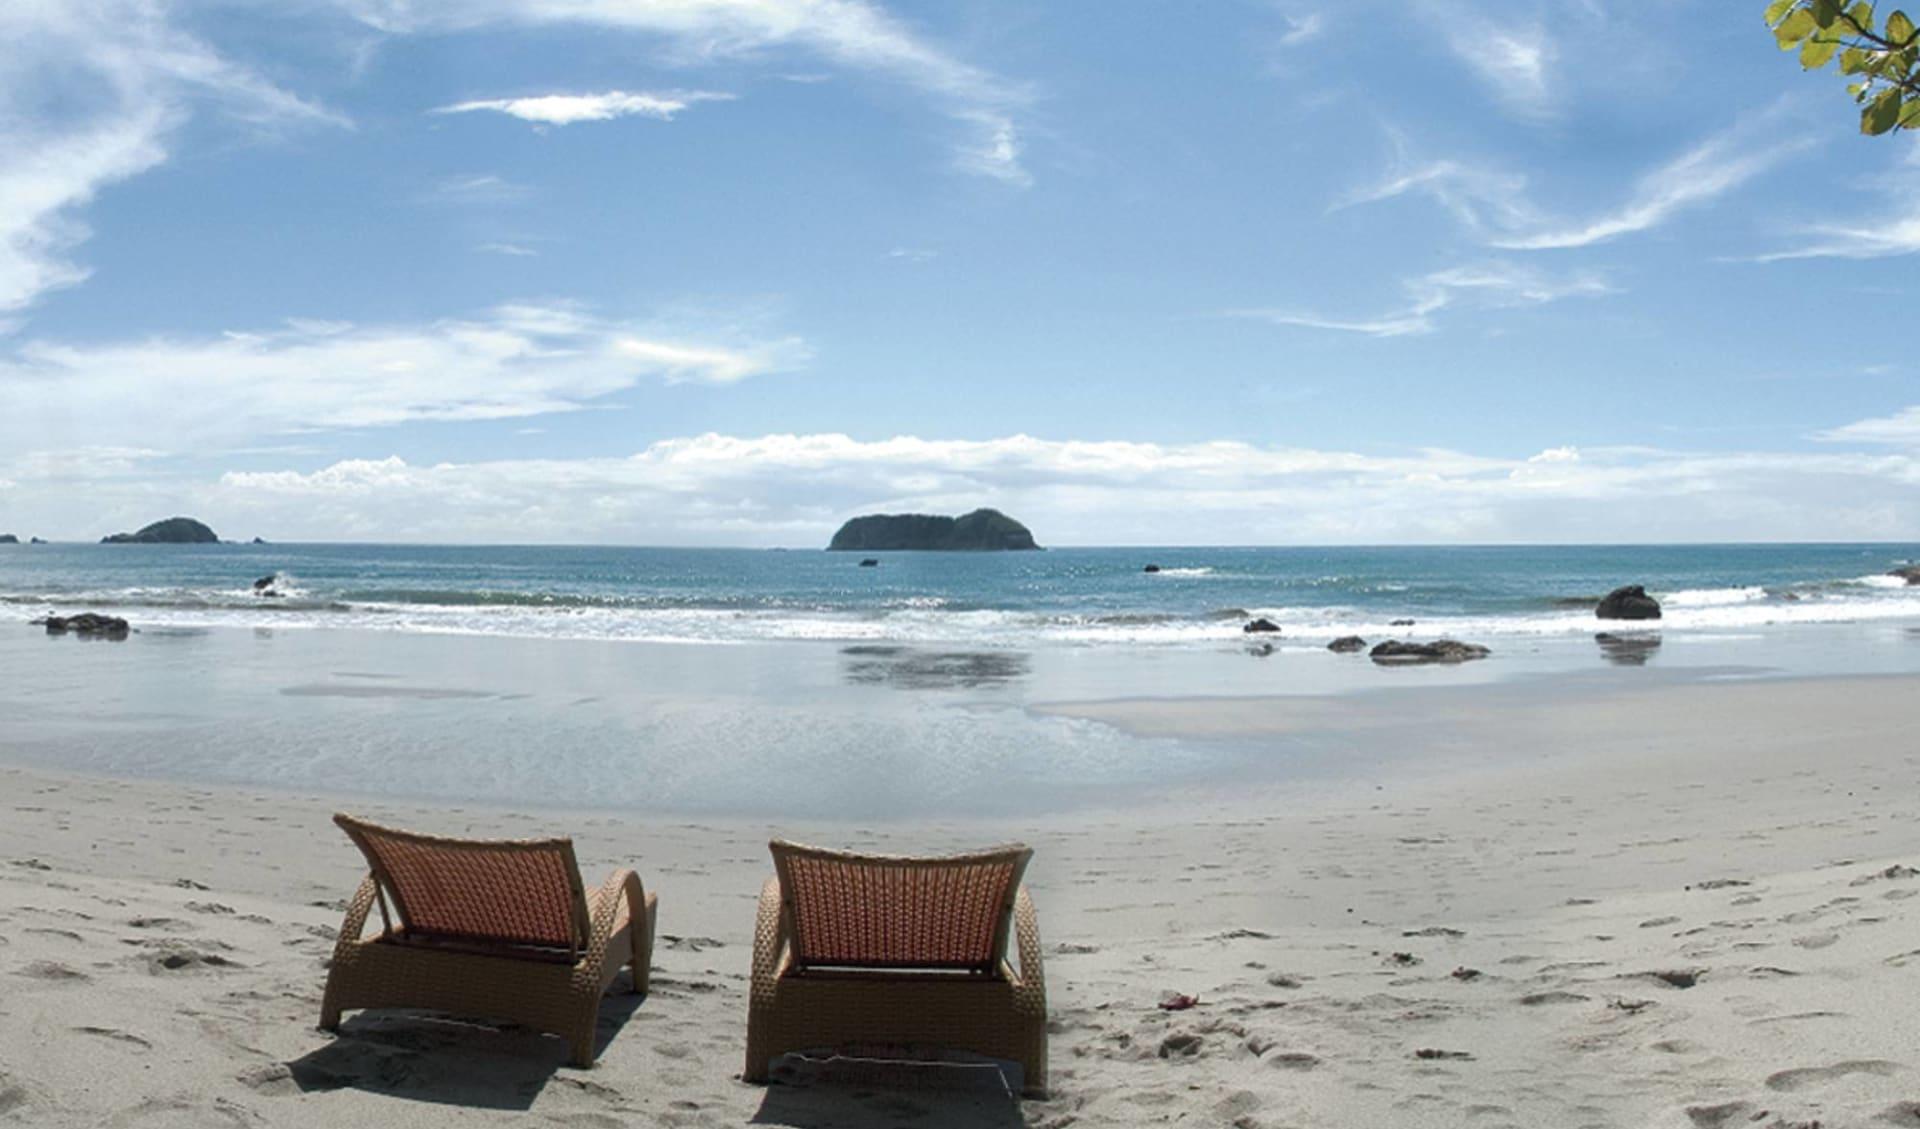 Arenas Del Mar Beachfront & Rainforest Resort in Manuel Antonio: natur arenas del mar strand liegestühle